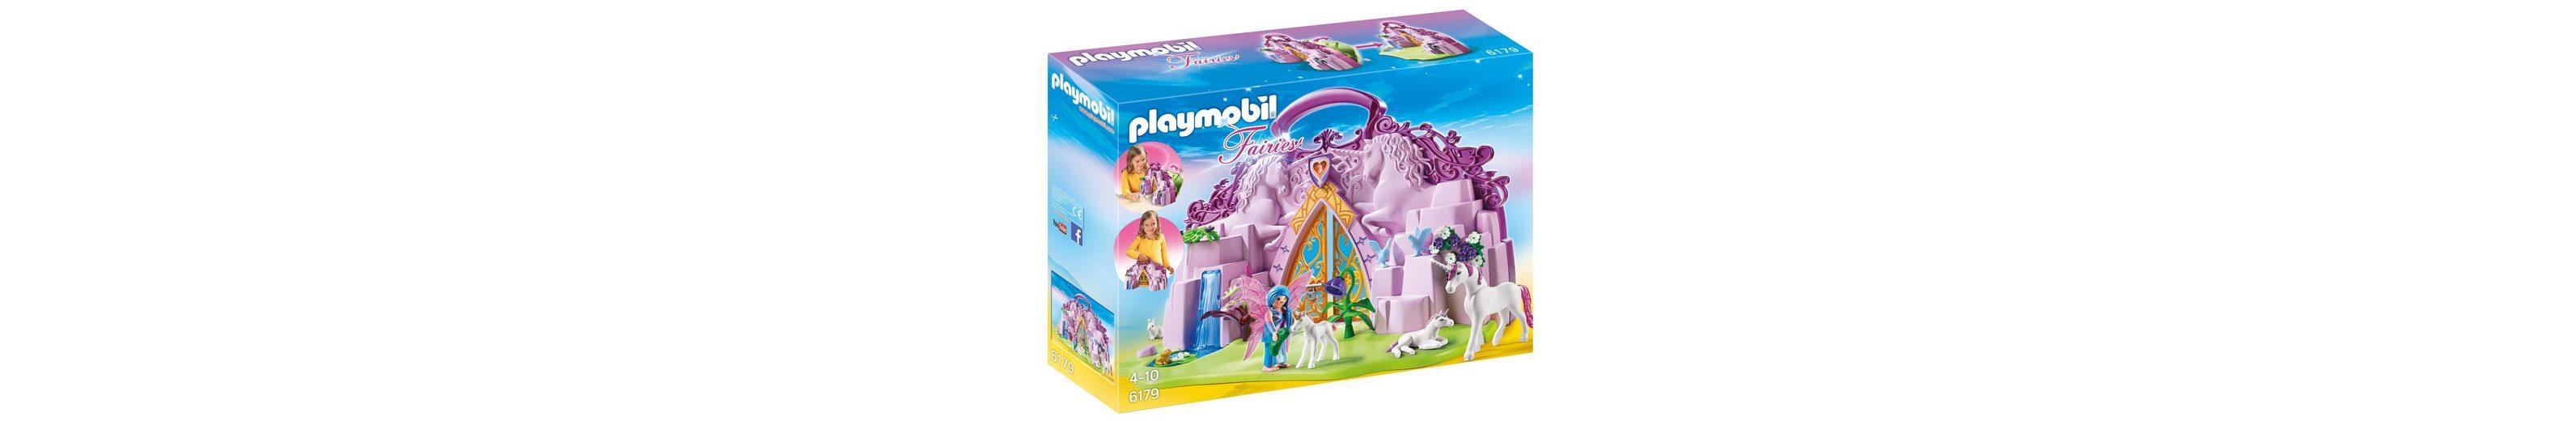 Playmobil® Einhornköfferchen Feenland (6179), »Fairies«